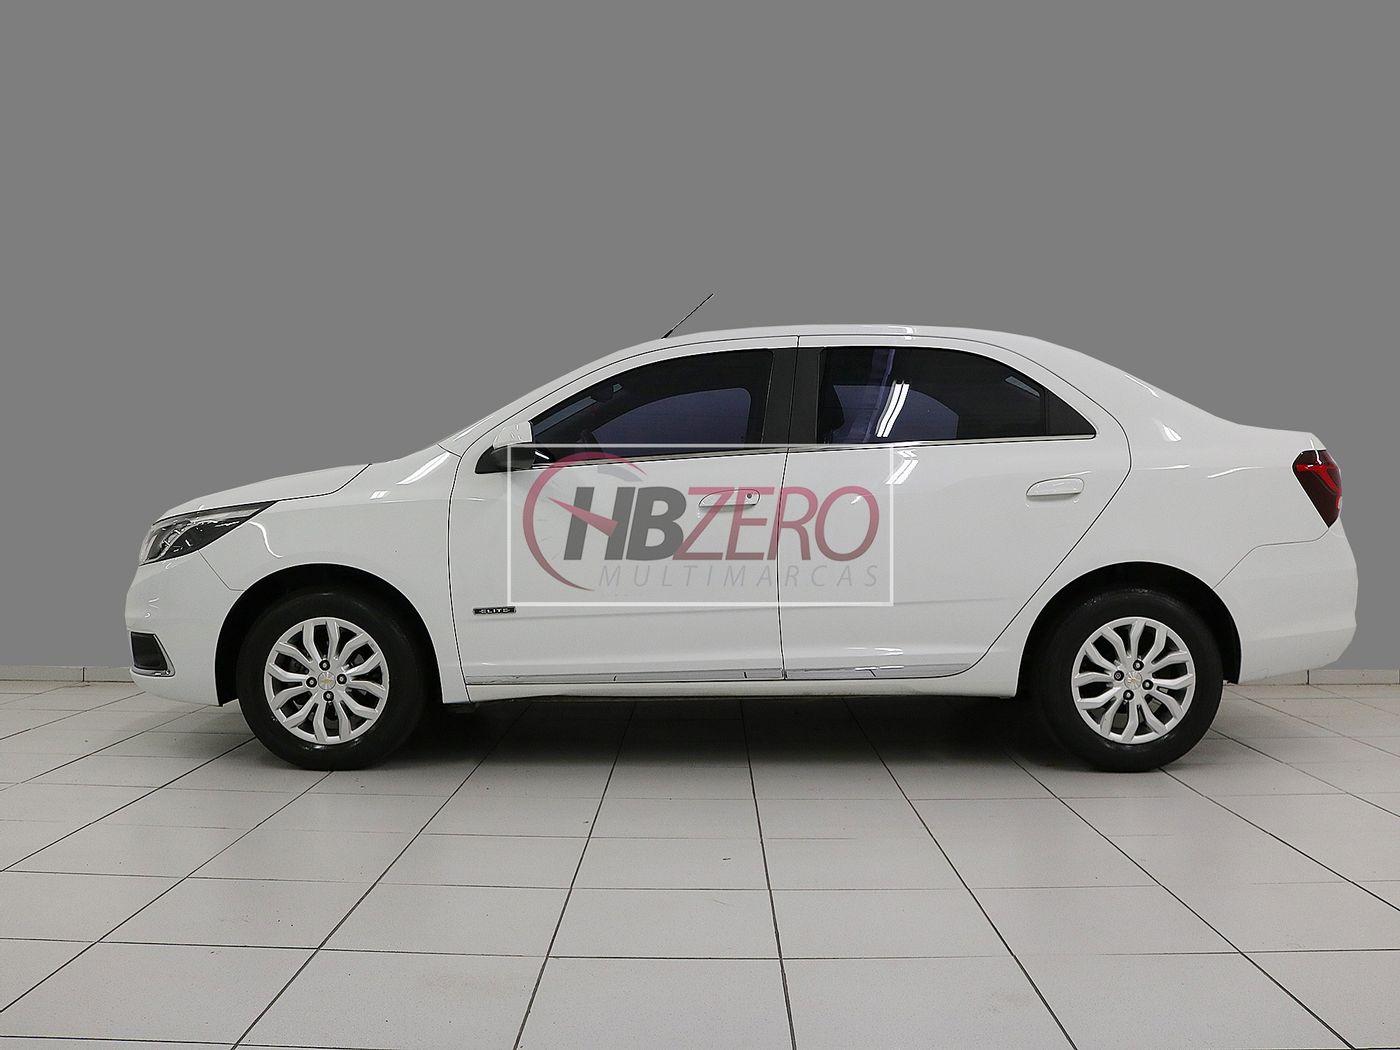 Chevrolet COBALT ELITE 1.8 8V Econo.Flex 4p Aut.